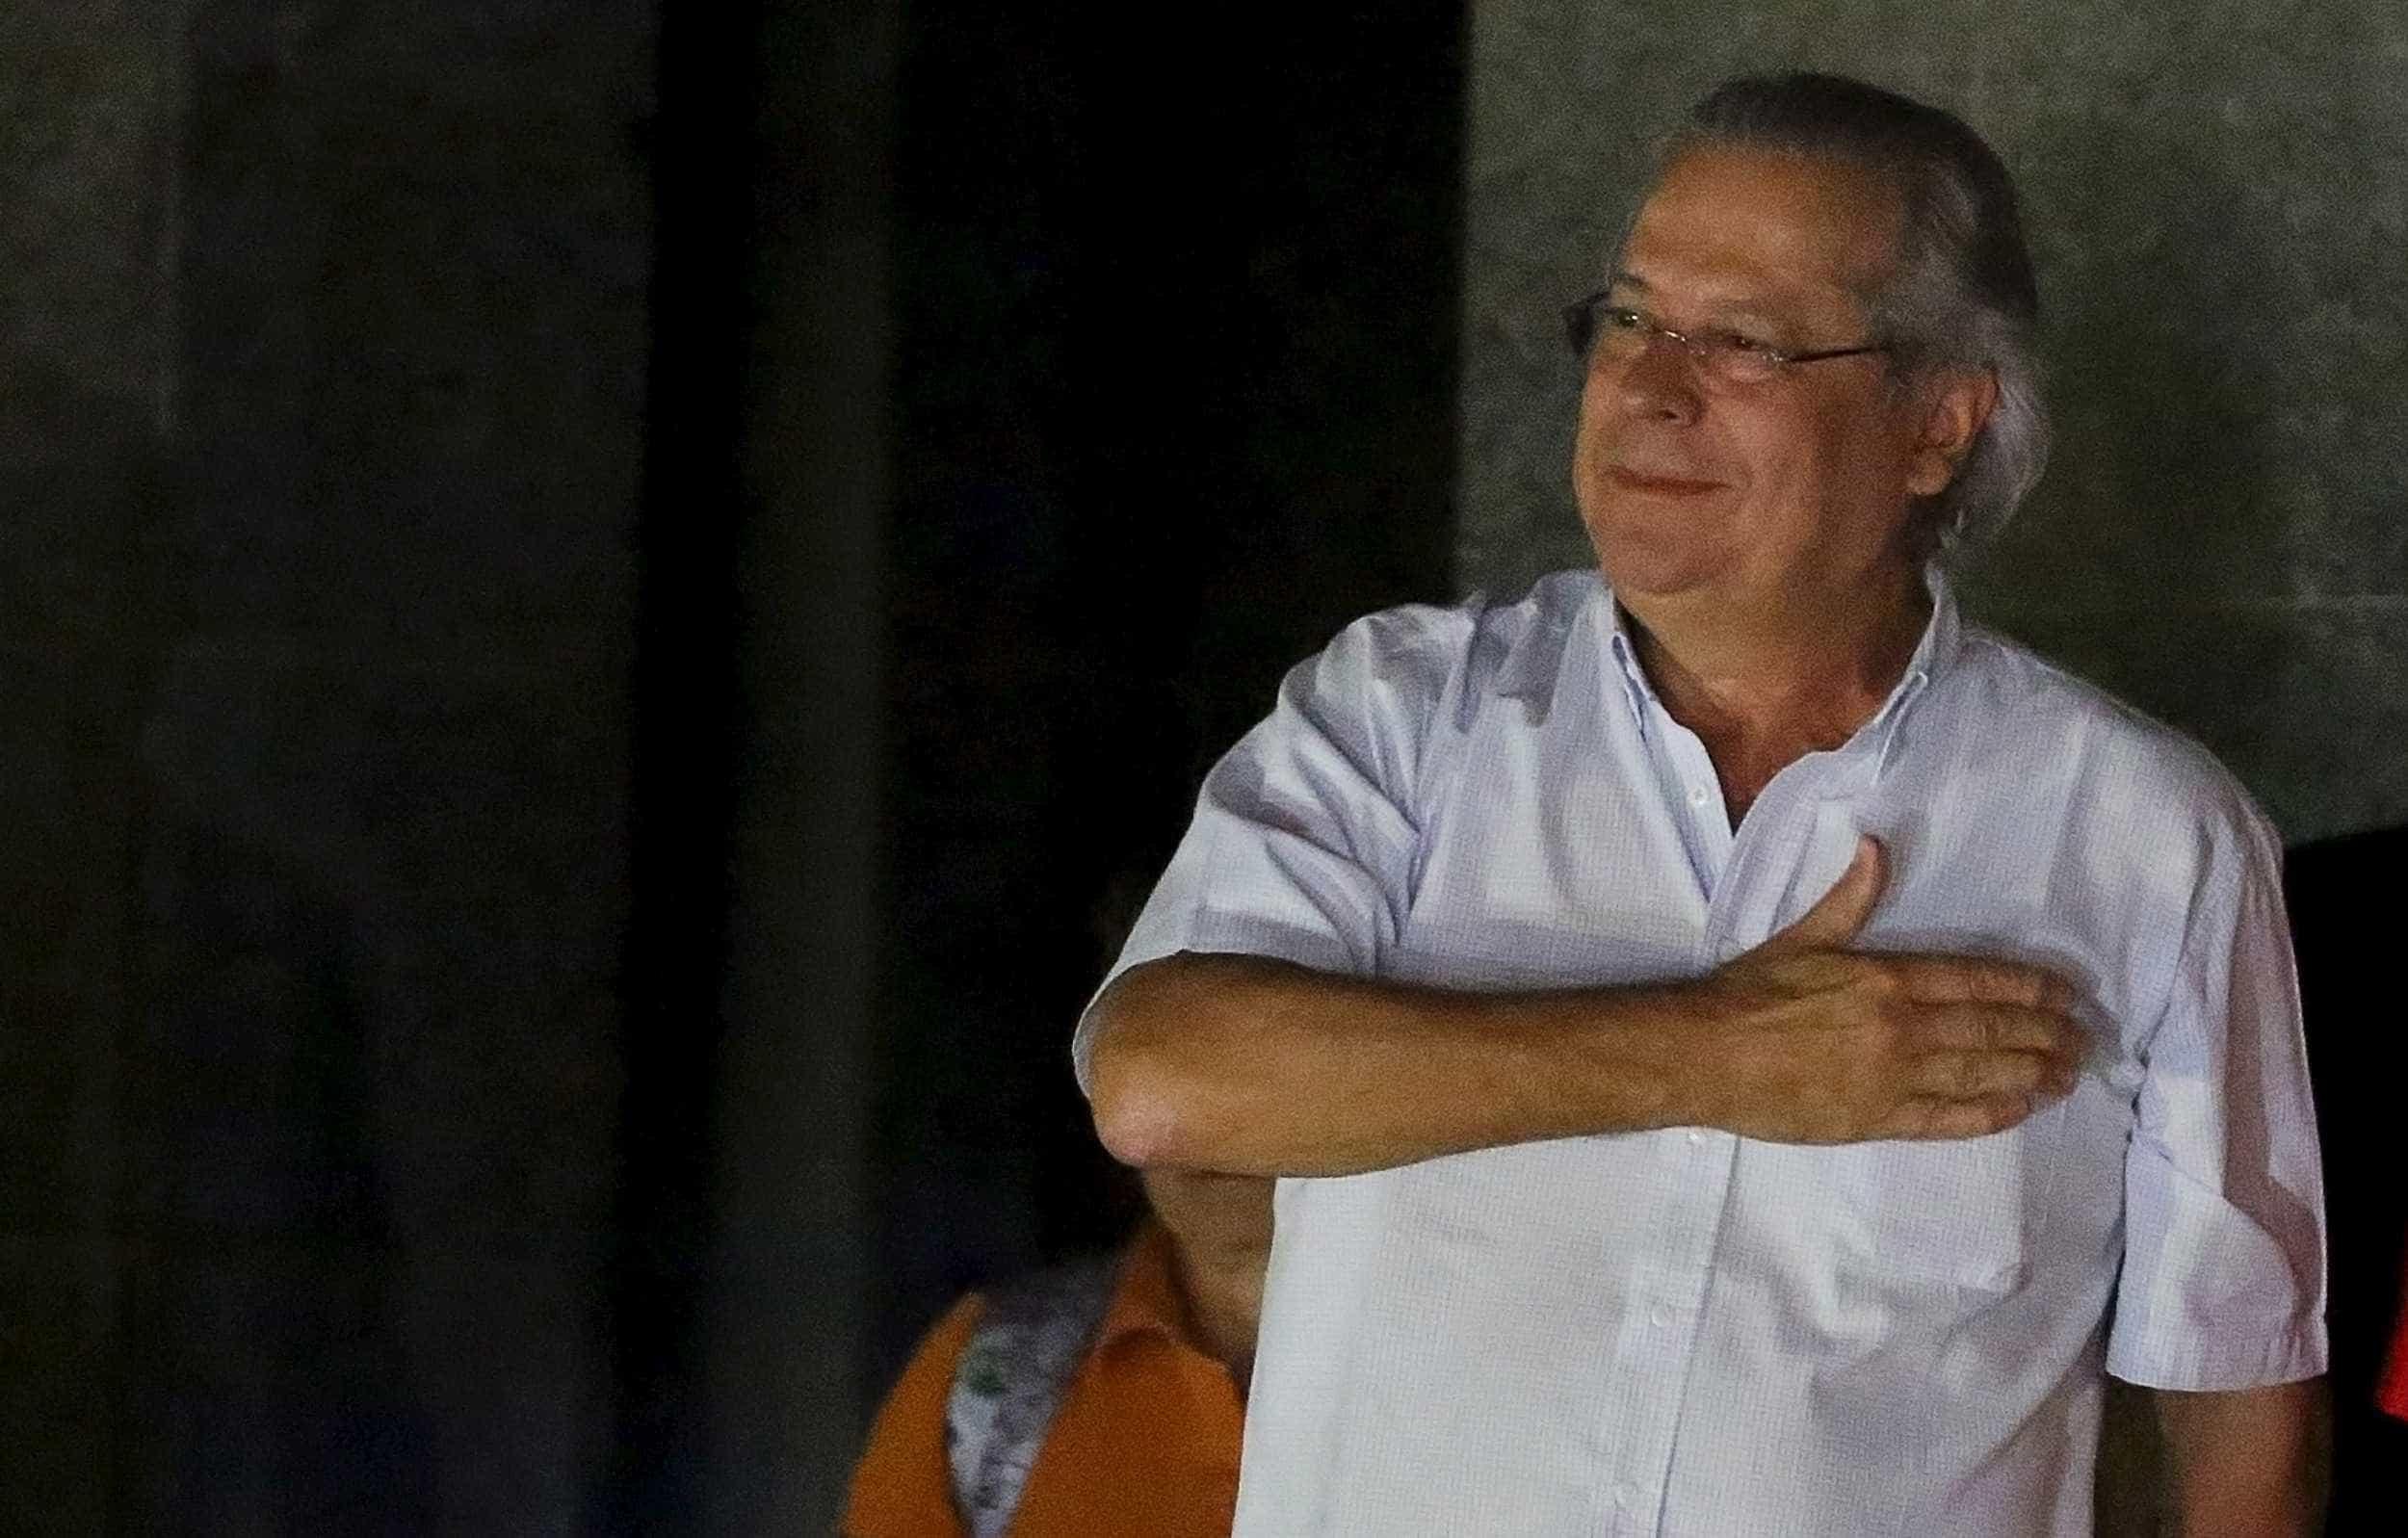 José Dirceu vira réu pela terceira vez na Lava Jato